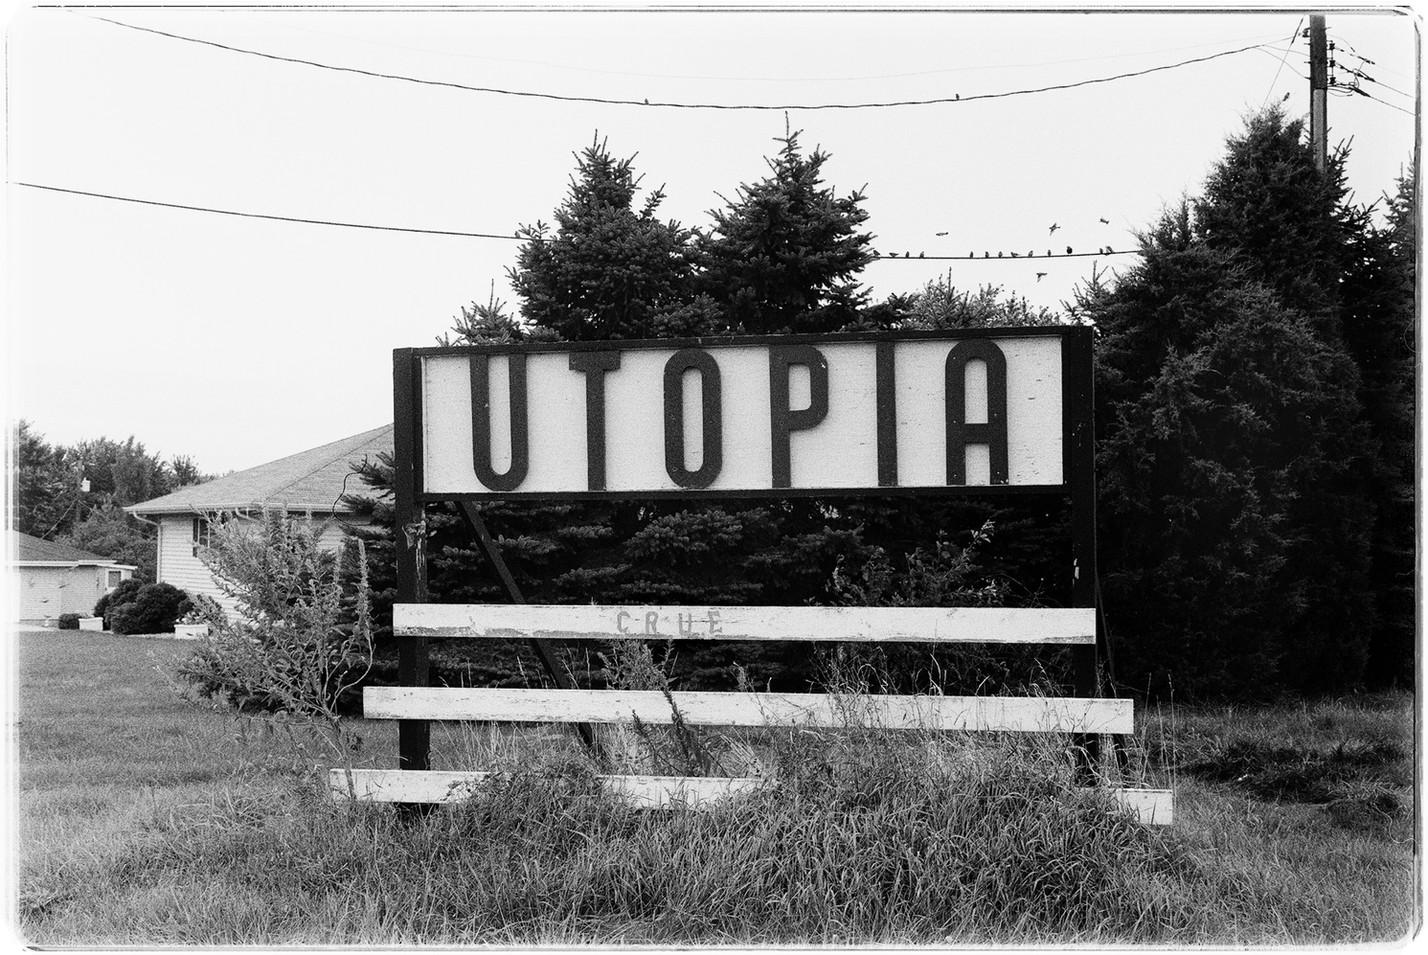 utopia photo_2 trim.jpg